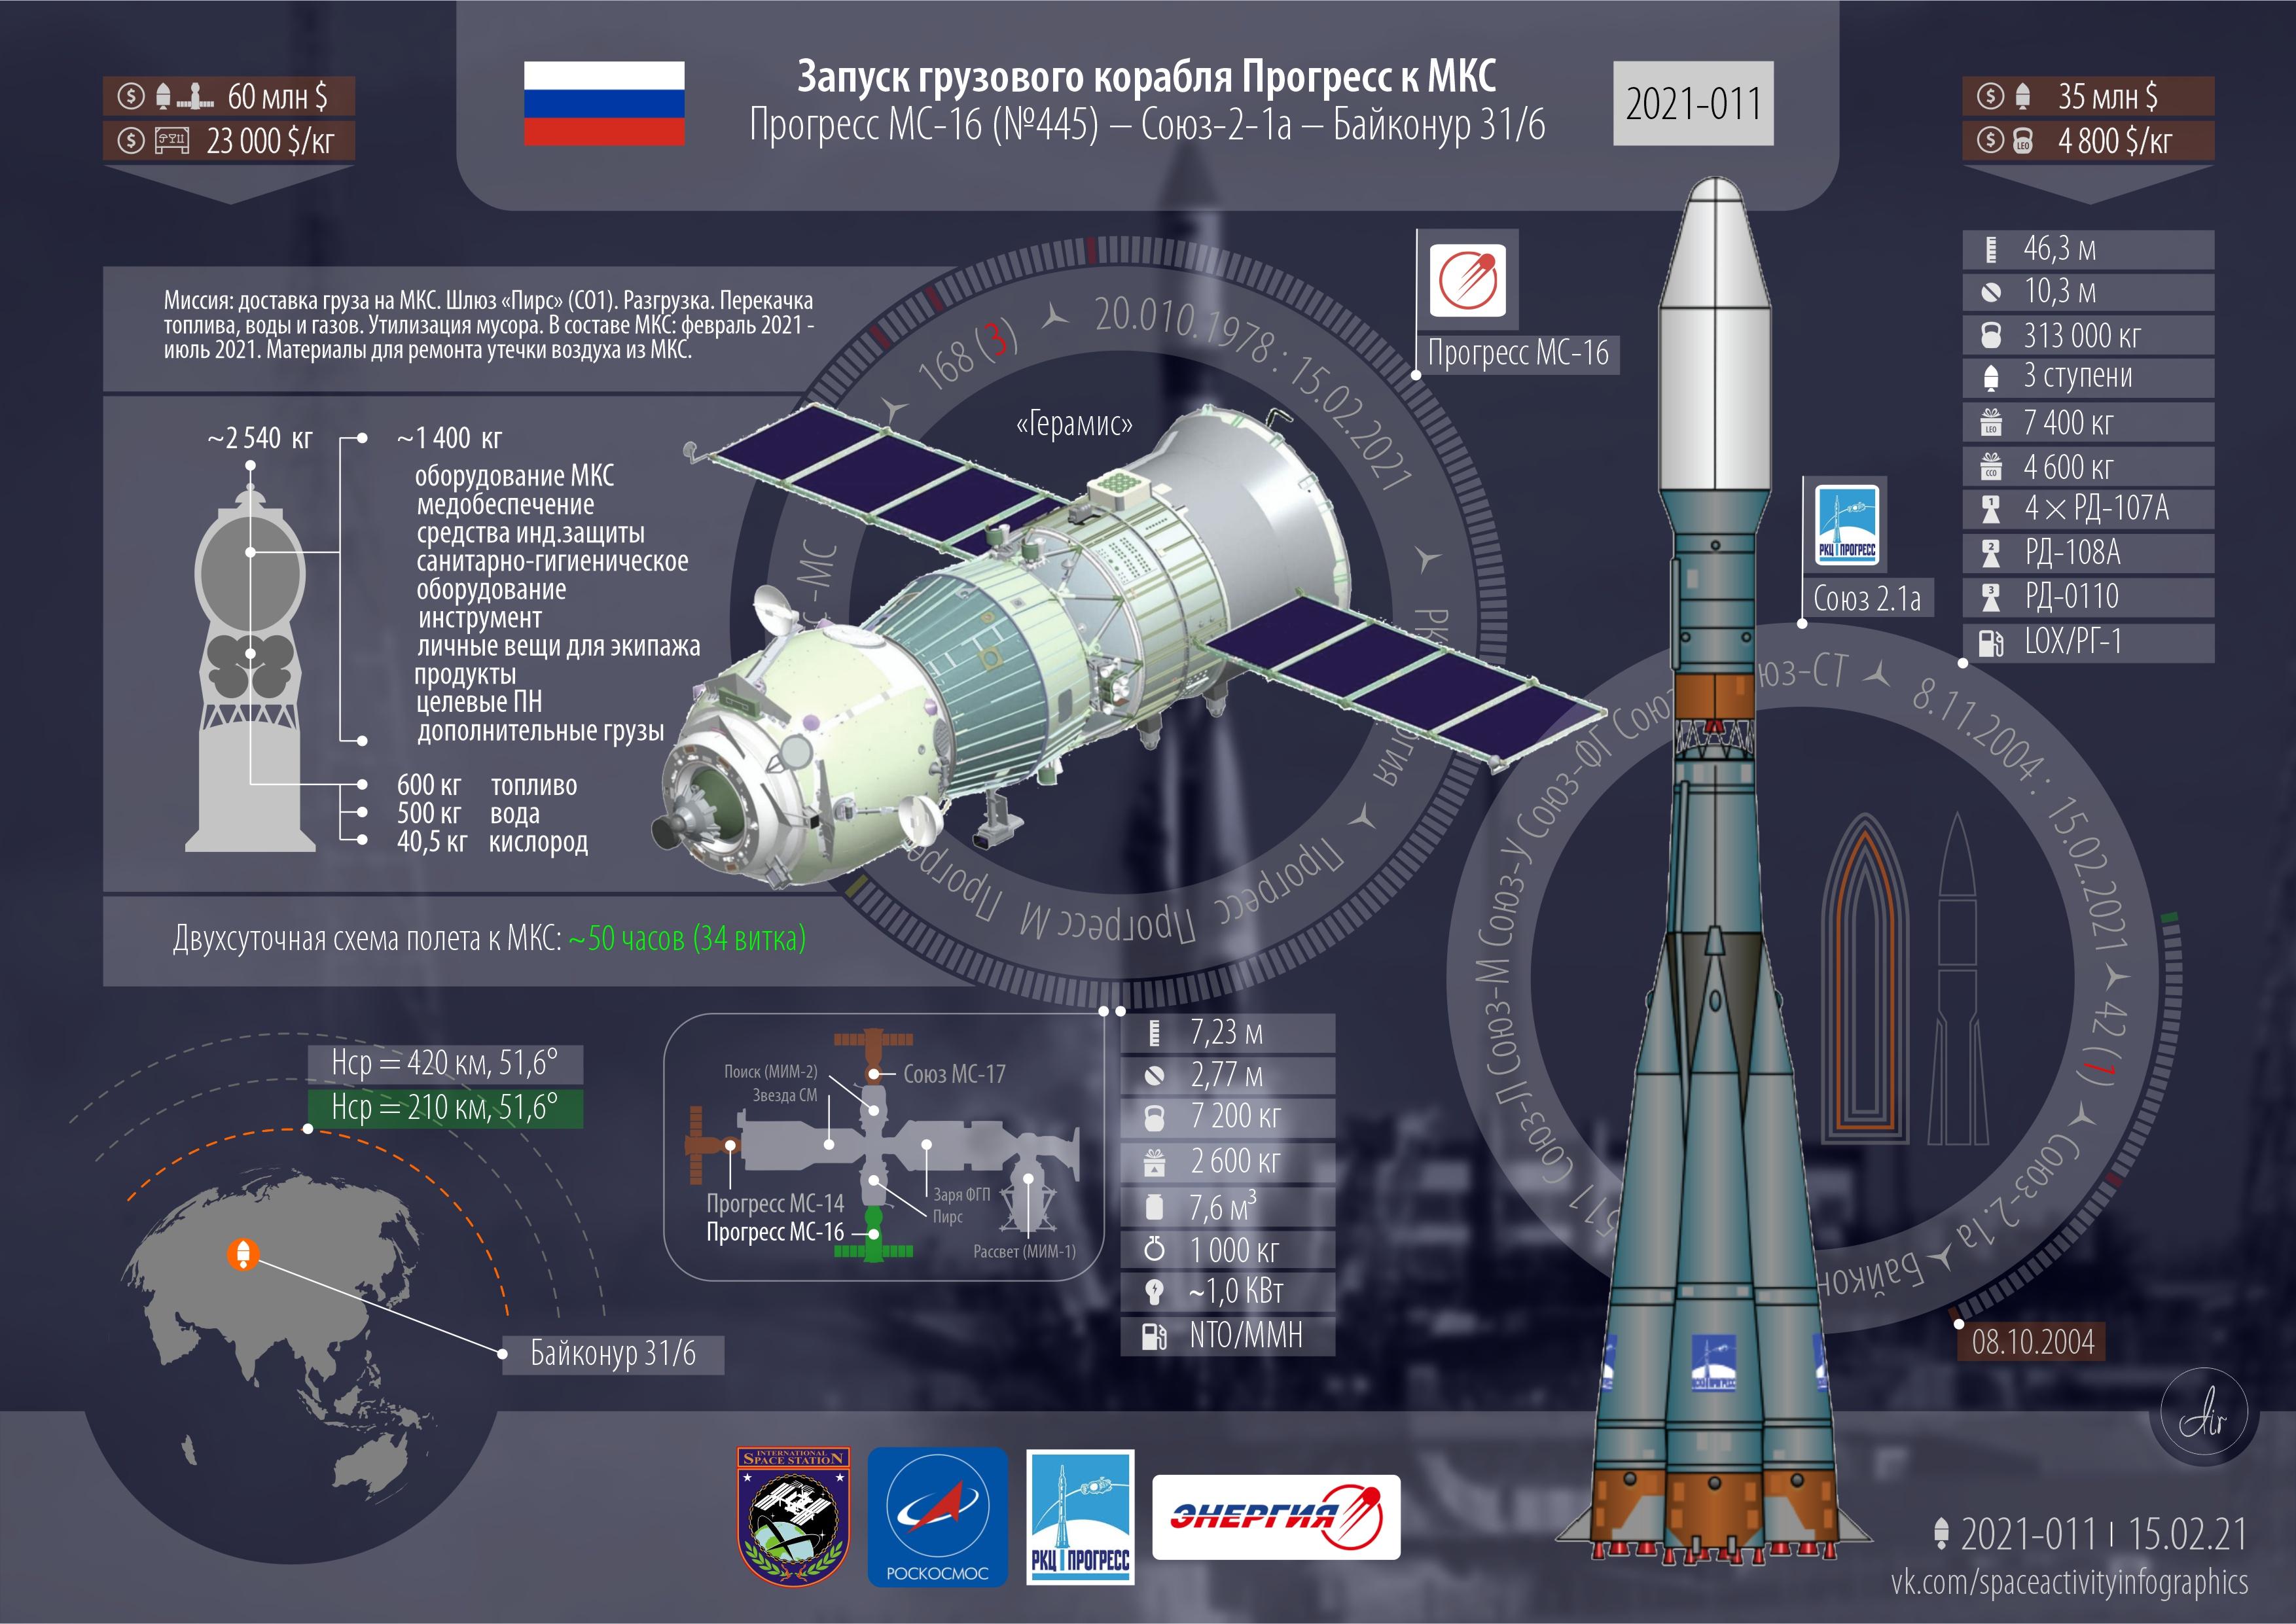 Союз 2.1а | Прогресс МС-16.